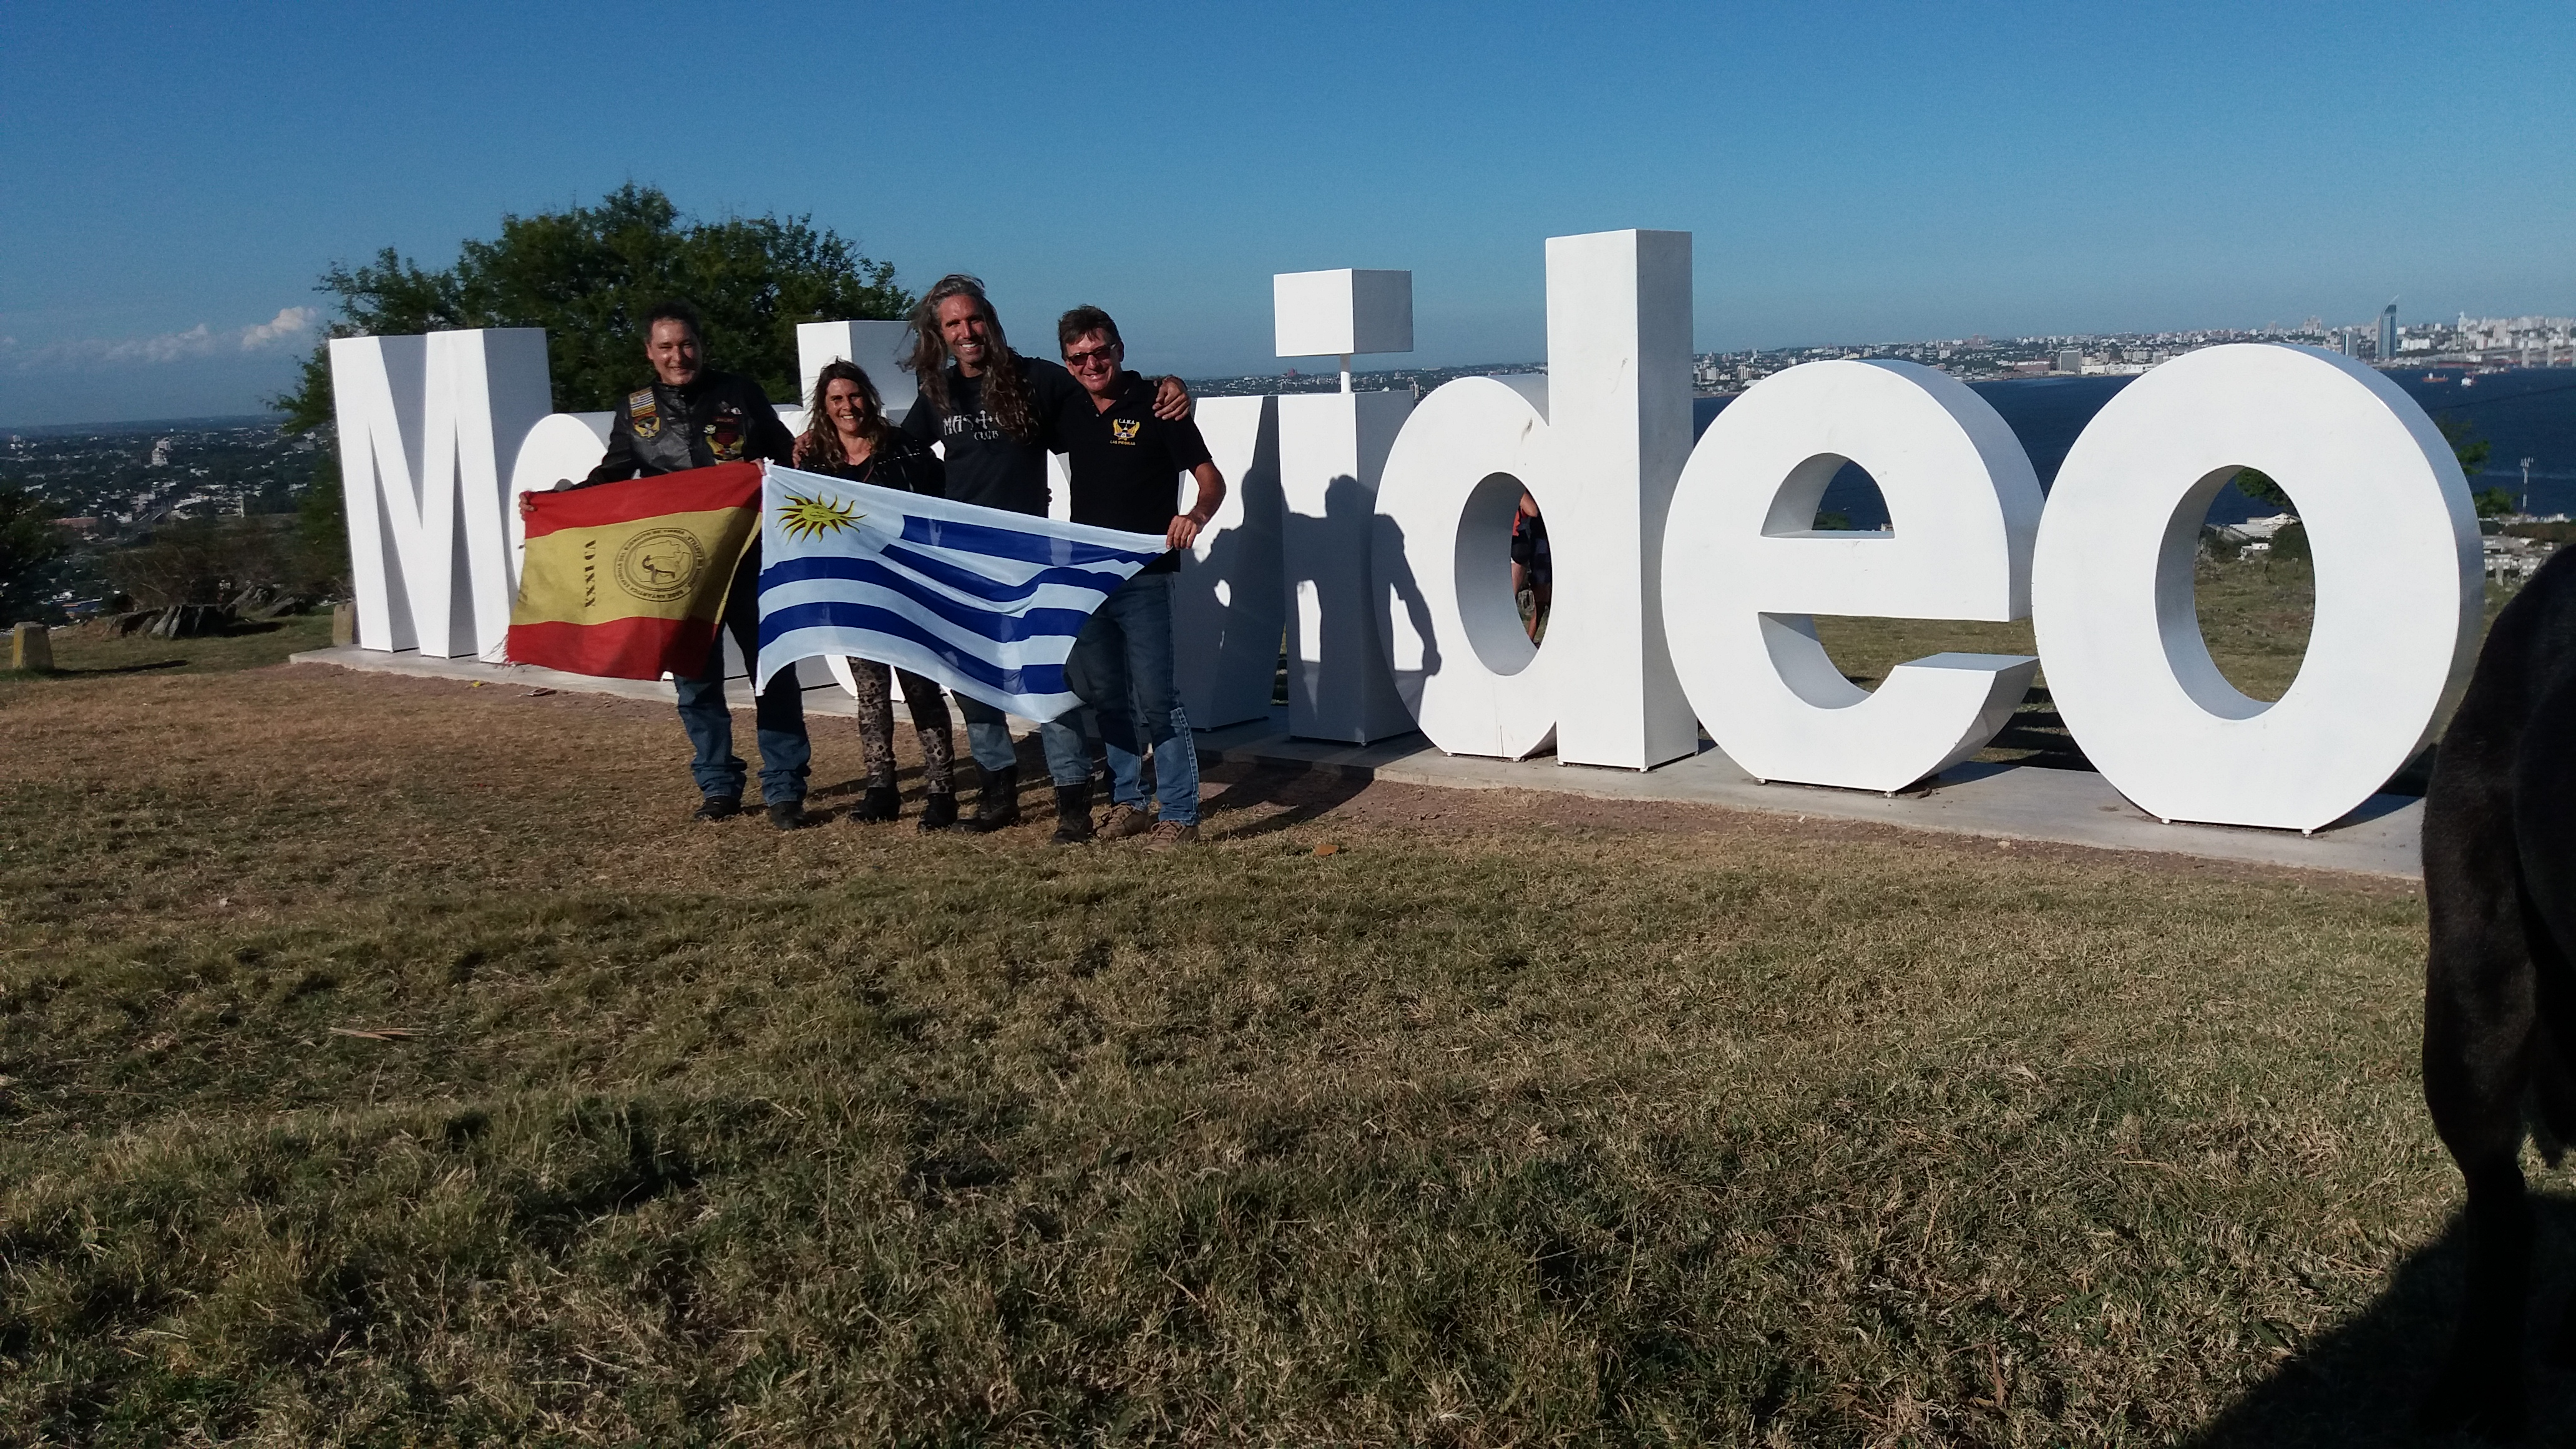 Montevideo – URUGUAY (1 Marzo 2018)